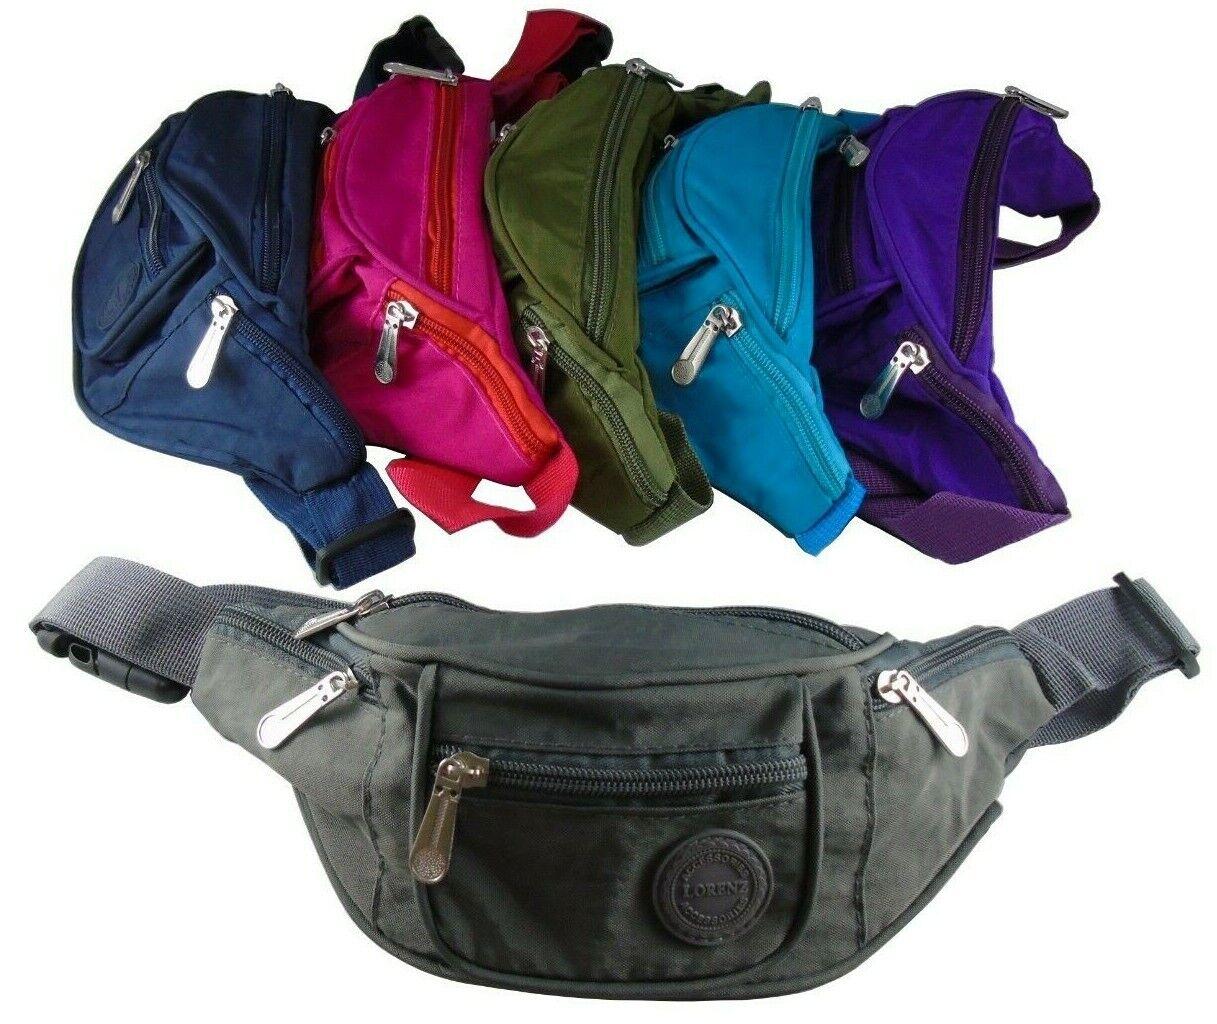 Waist Belt Bag for Girls Kids Teens Boys with Multi-Pockets DONVITER Fanny Packs for Women /& Men Casual Black Fanny Pack Cute Hip Bum Bags for Travel Hiking Concert Running Dog Walking